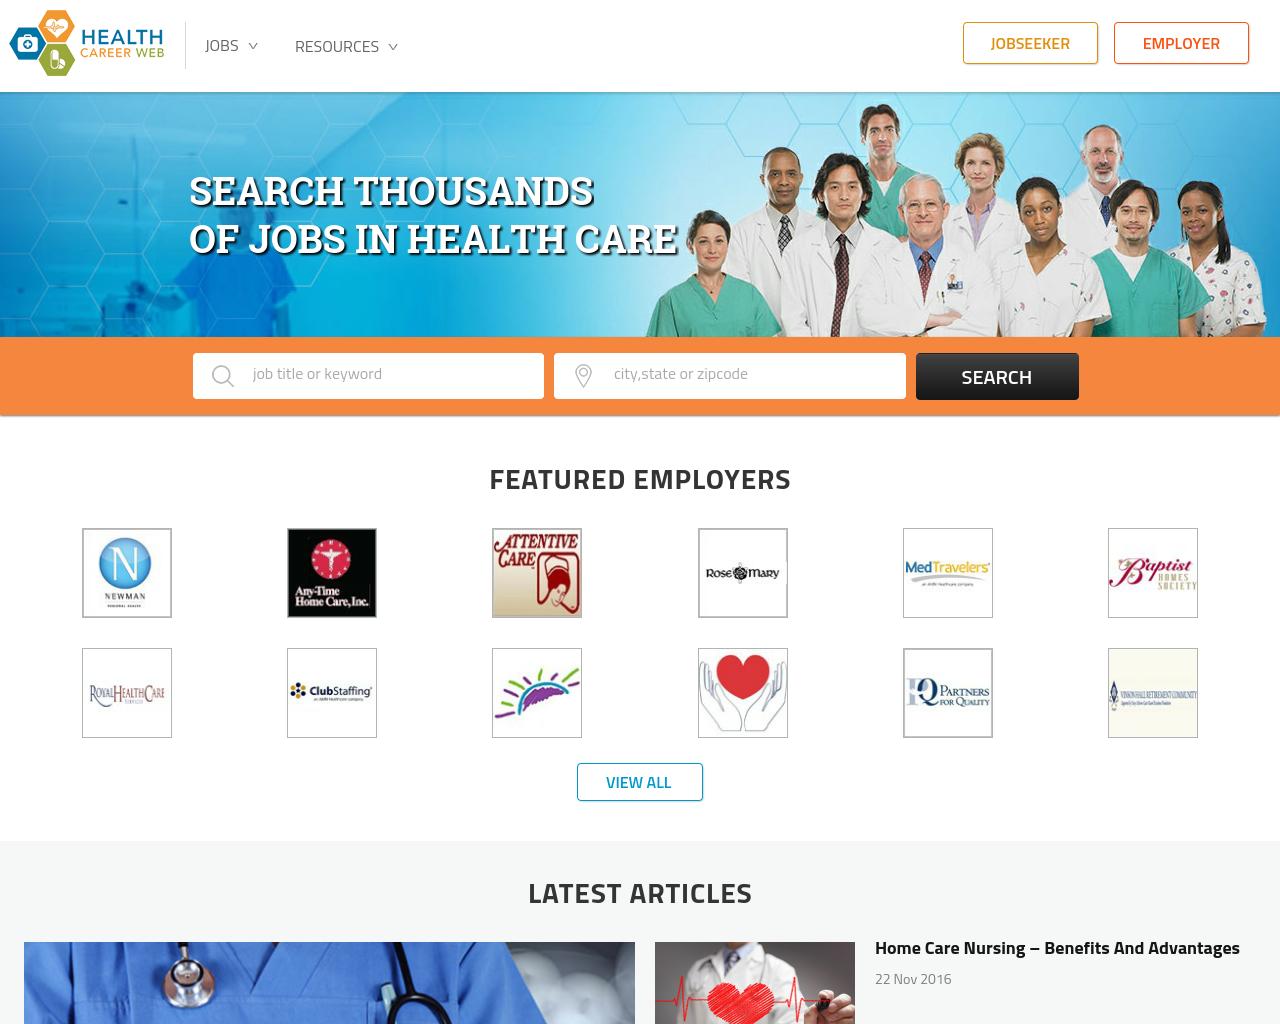 Health-Career-Web-Advertising-Reviews-Pricing